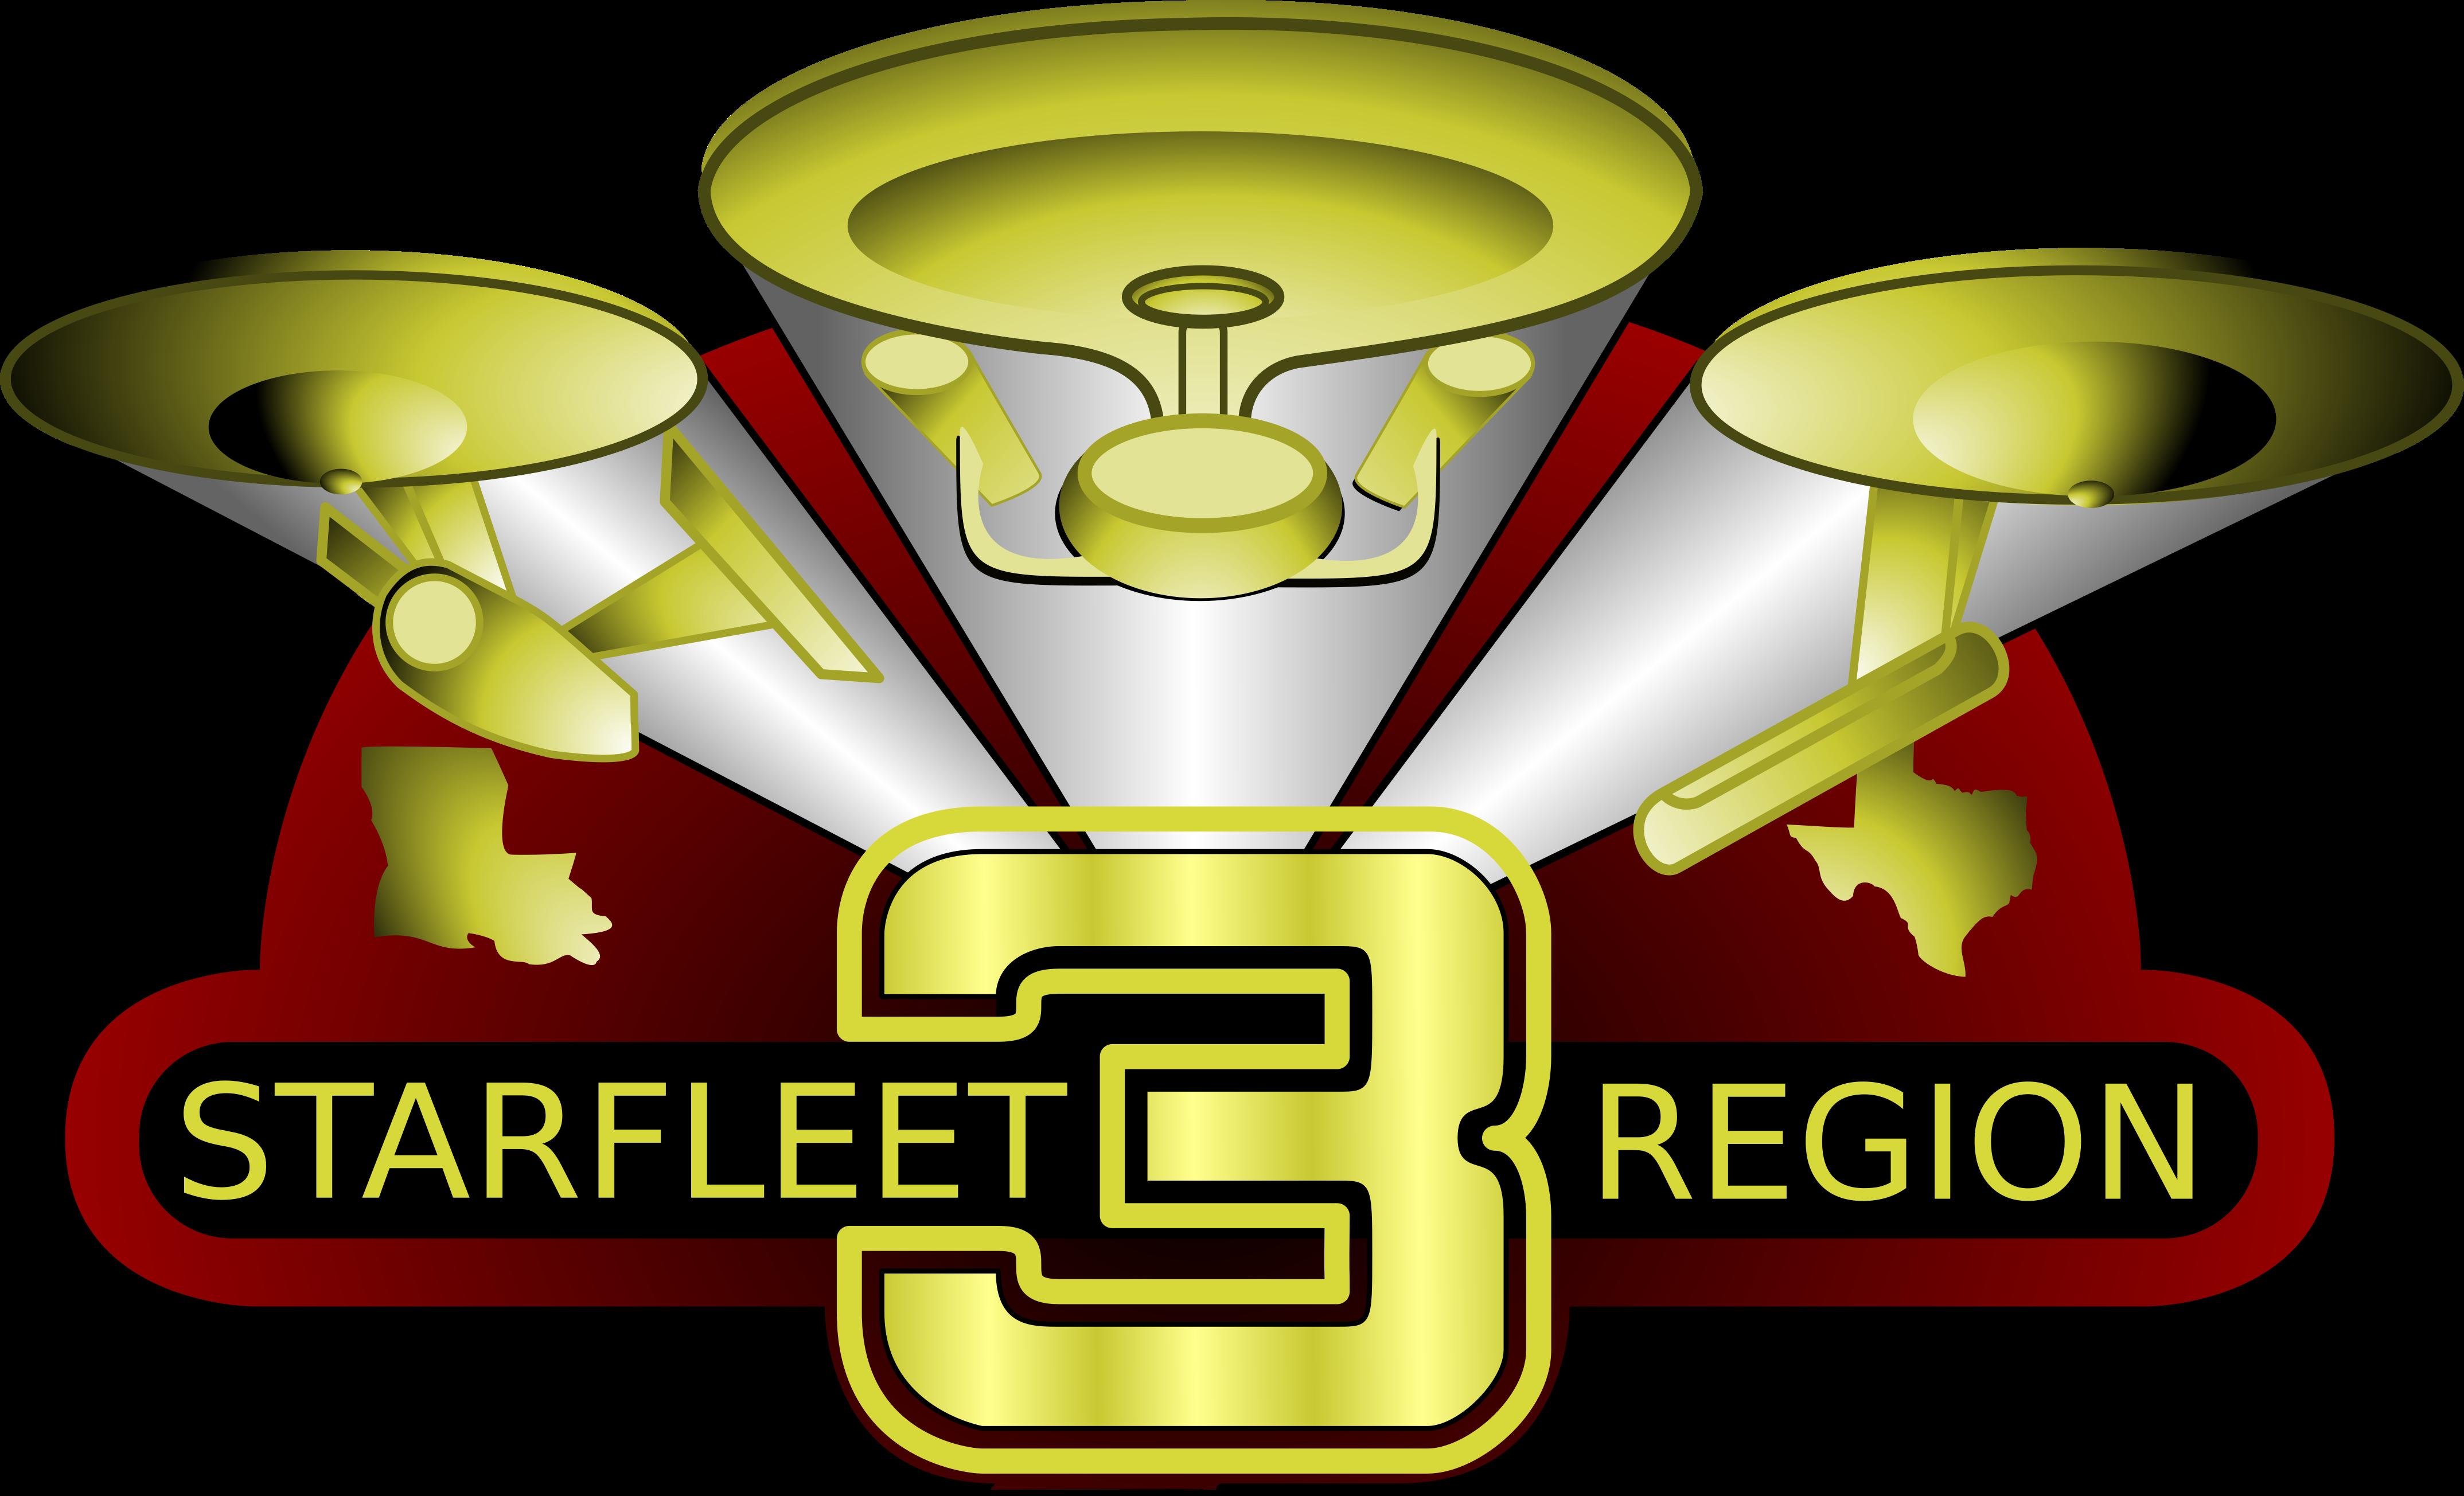 STARFLEET Region 3